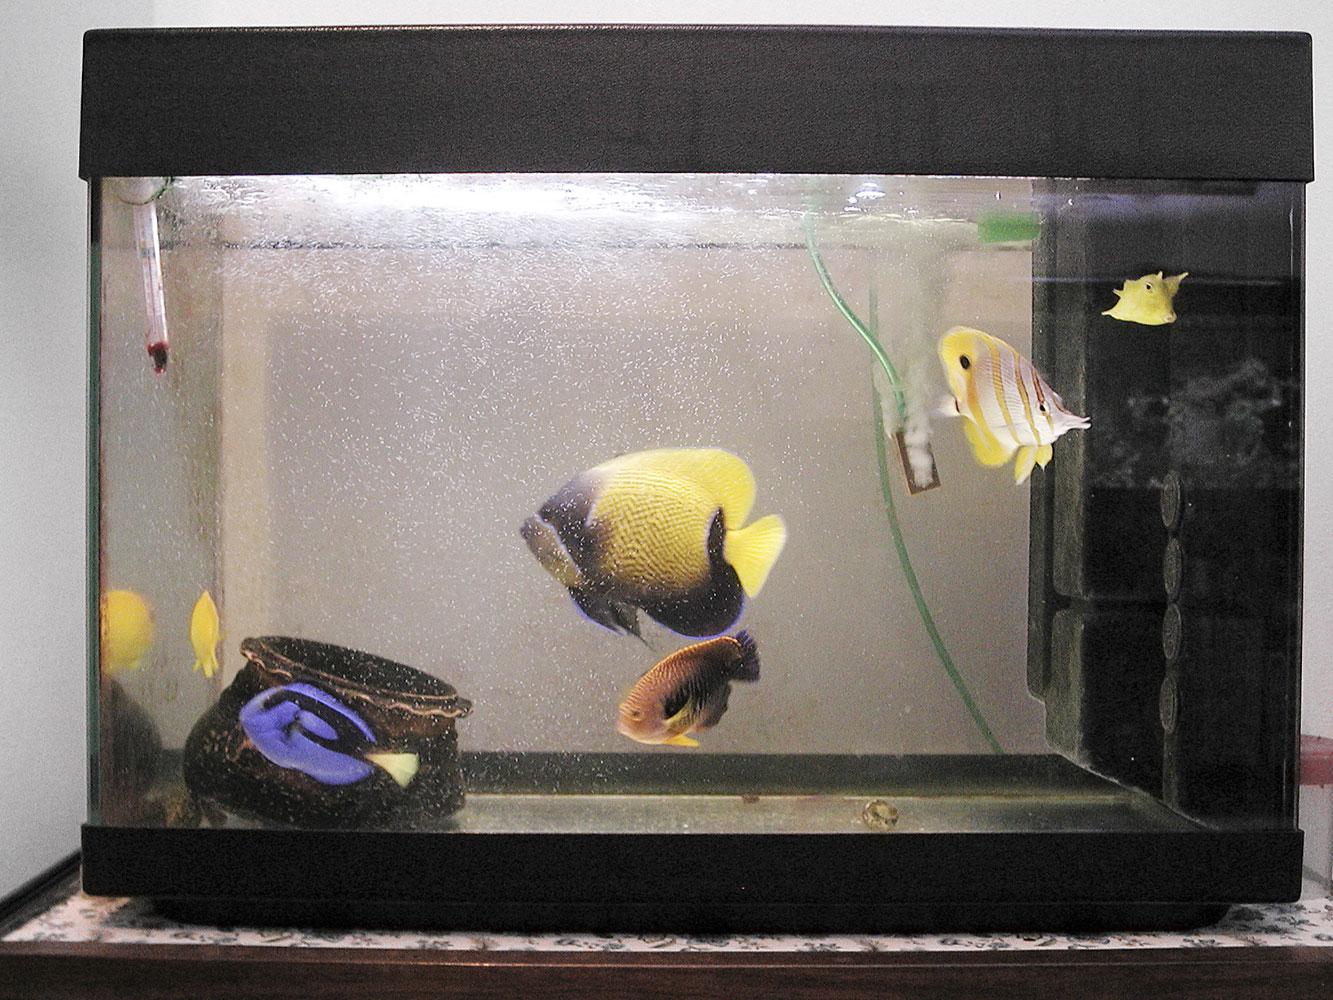 Cryptocaryon irritans un nemico insidioso for Vasca per pesci